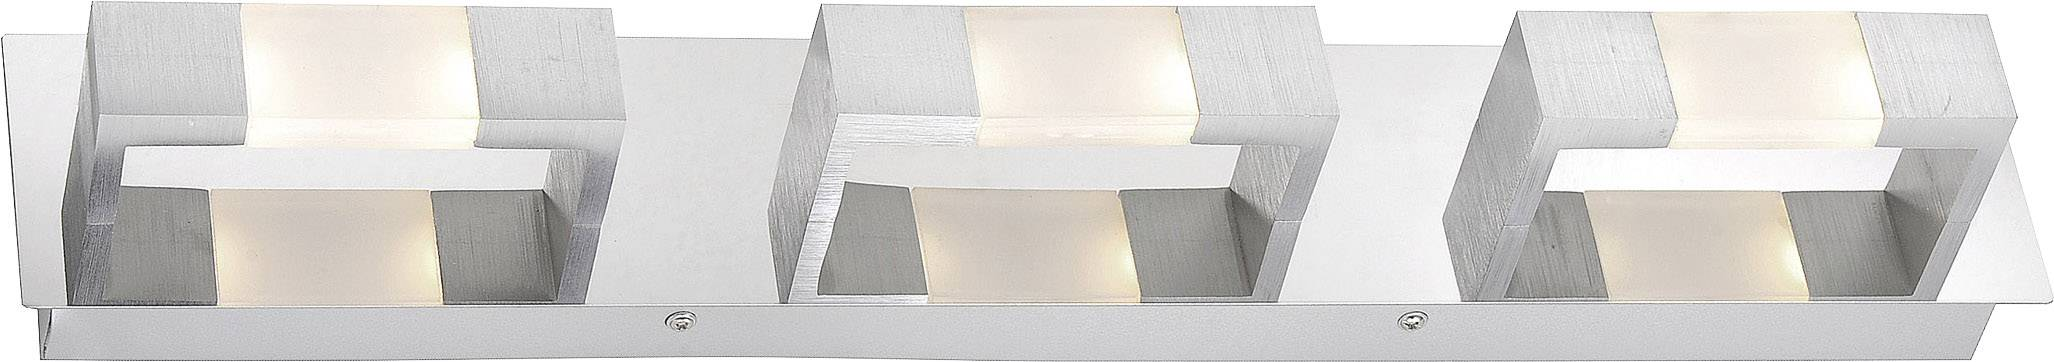 LED nástěnné světlo Paul Neuhaus Kemos 2196-96, 14.4 W, teplá bílá, hliník